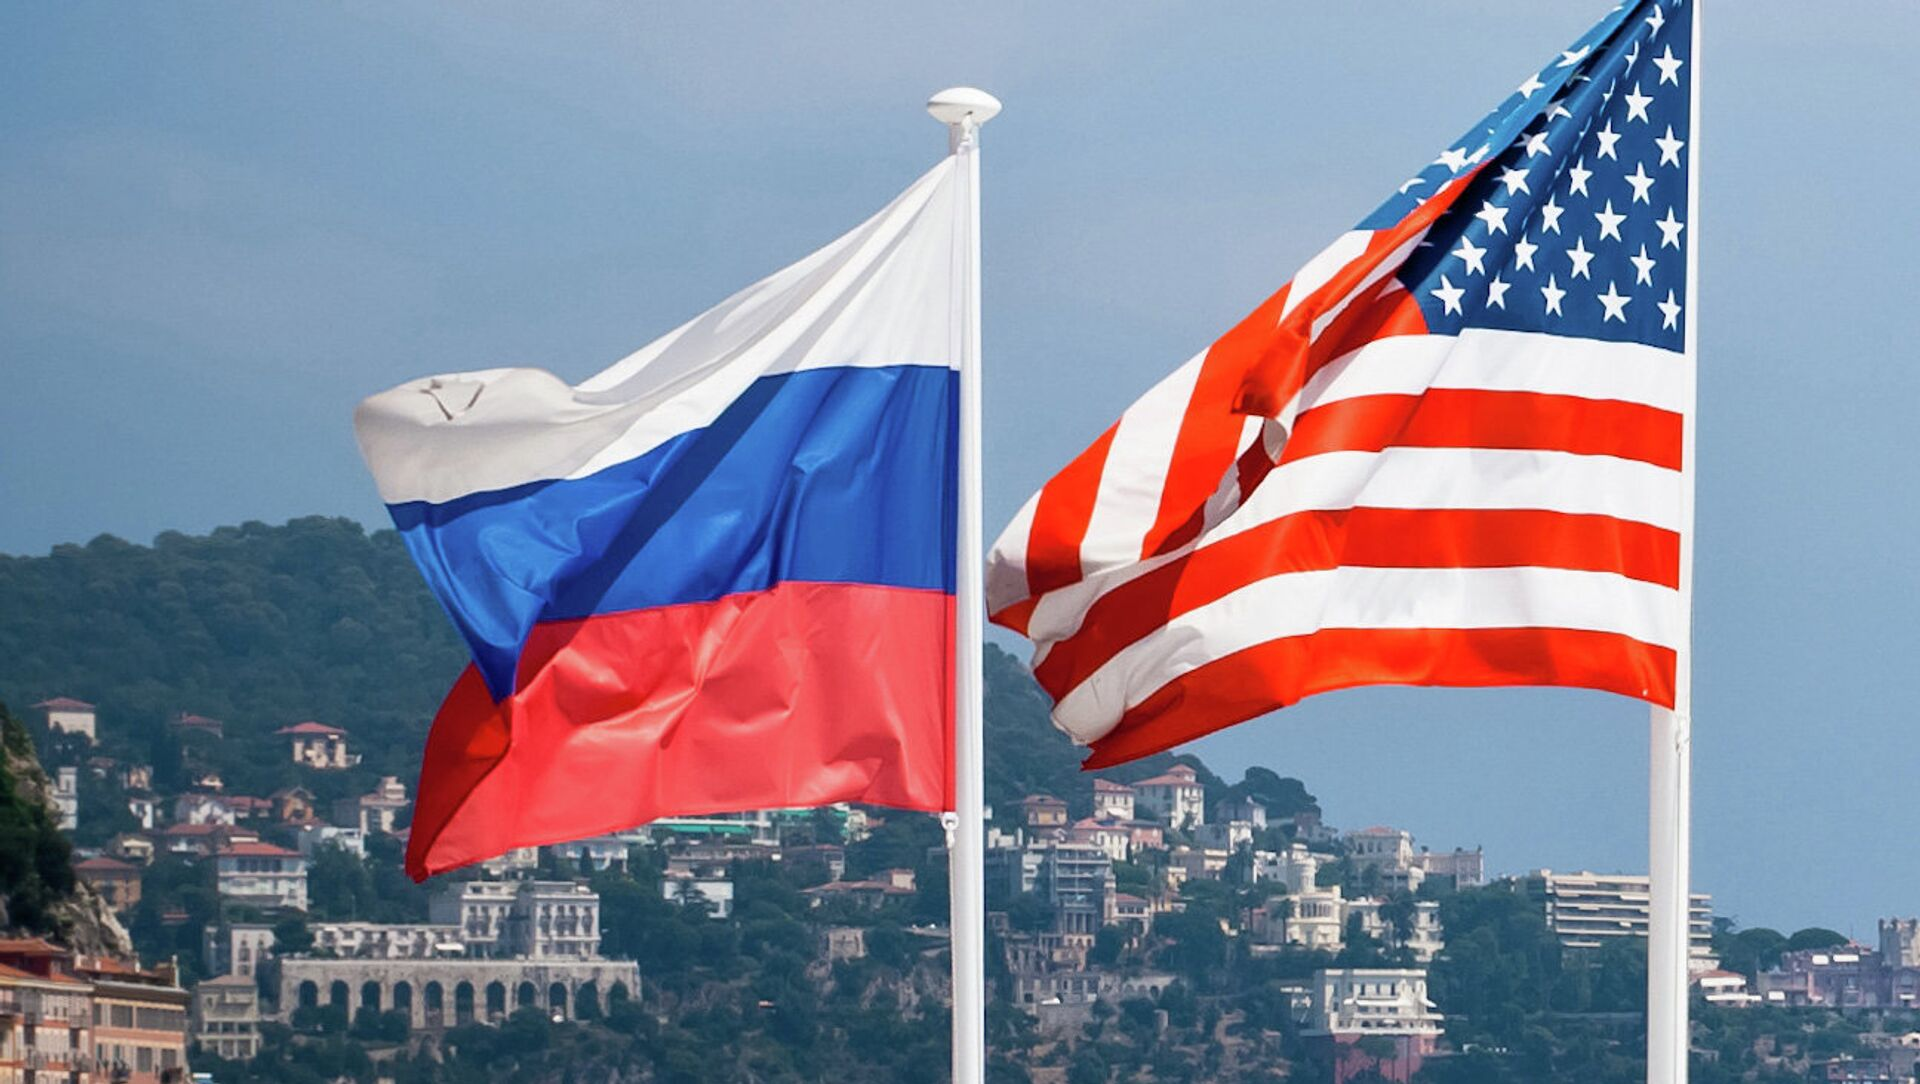 Flagi Rosji i USA - Sputnik Polska, 1920, 03.02.2021